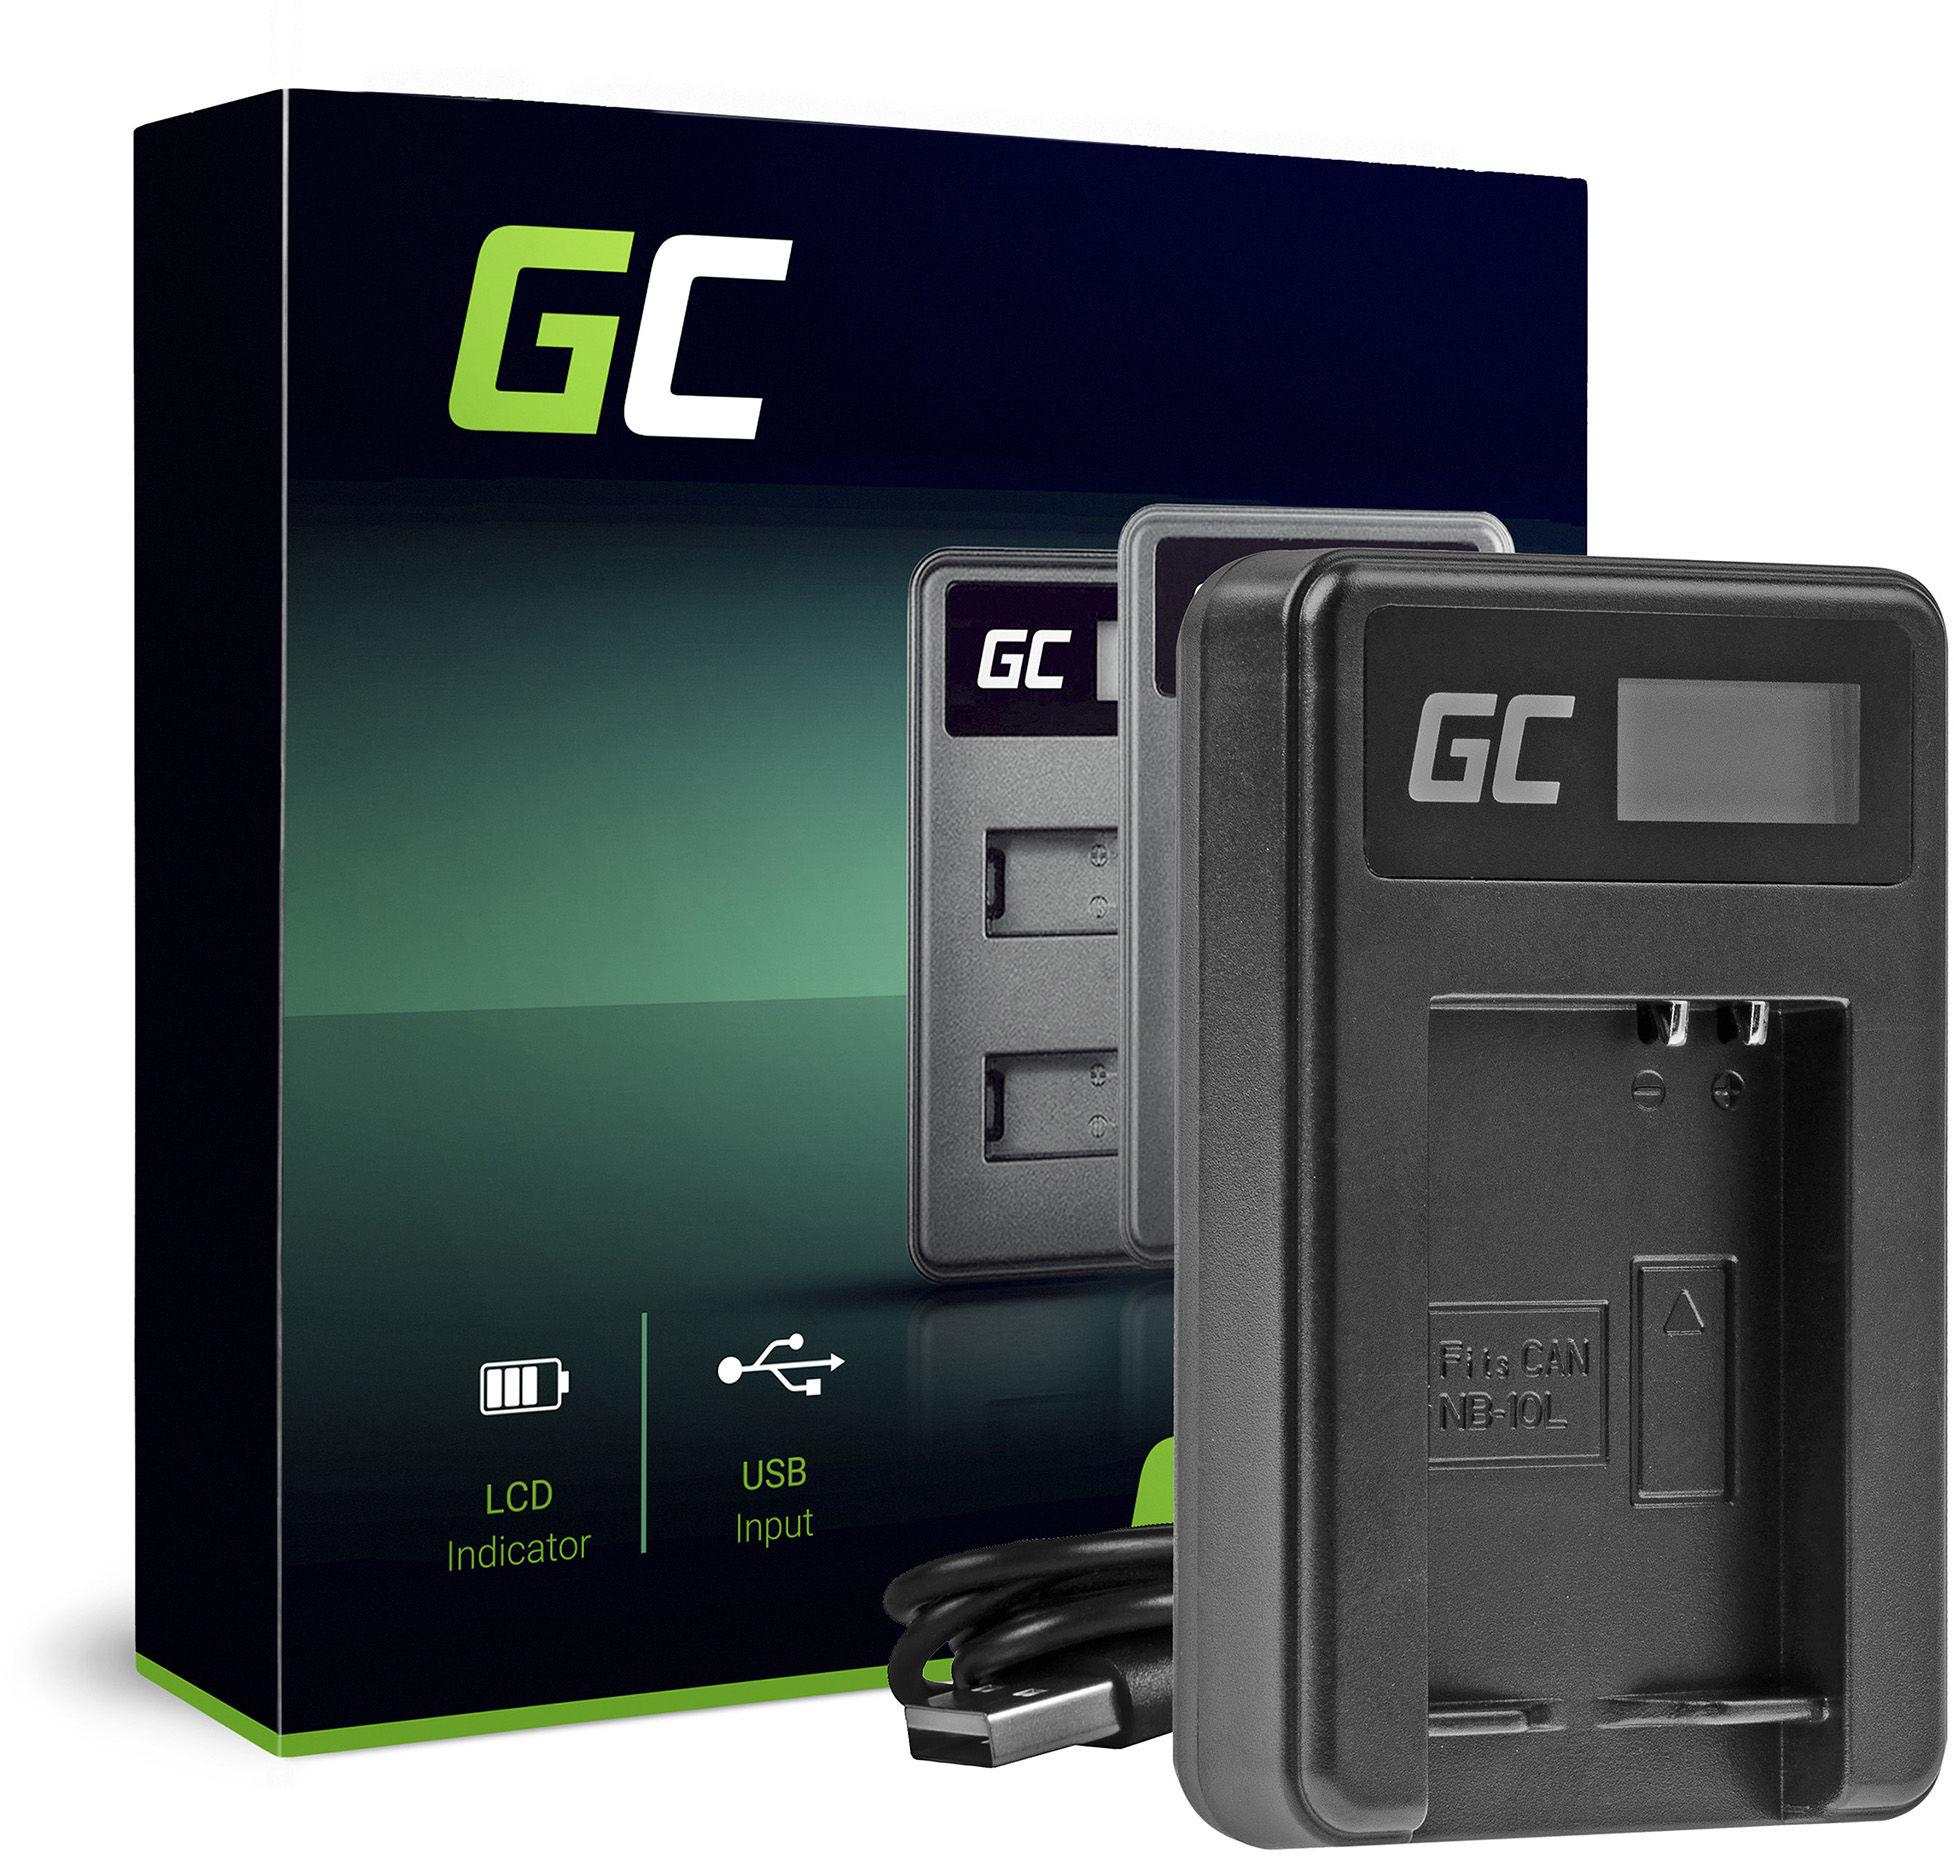 Ładowarka CB-2LCE Green Cell  do Canon NB-10L, PowerShot G1 G3 G10 G15 G16 G1X G3X SX40HS SX50HS SX60HS (5W 8.4V 0.6A)